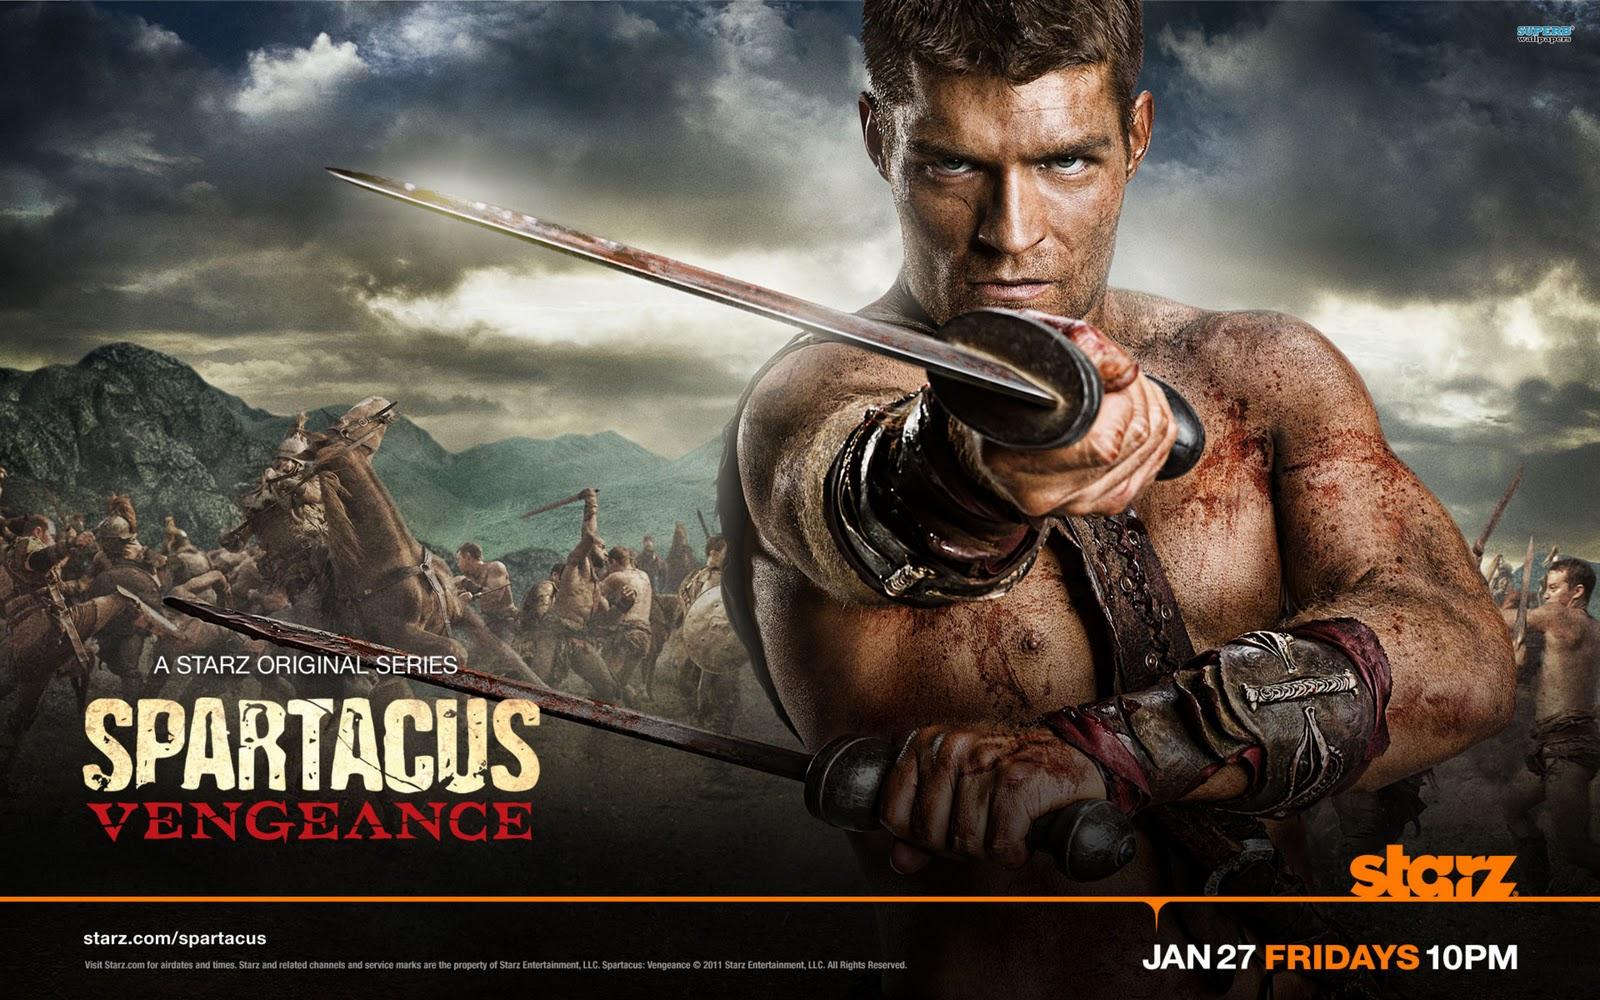 http://4.bp.blogspot.com/-yYMxQ-iSJbc/TyvIL7ZGIfI/AAAAAAAAADI/EpX4rZ9fsdE/s1600/spartacus-spartacus-vengeance-10260-2560x1600.jpg